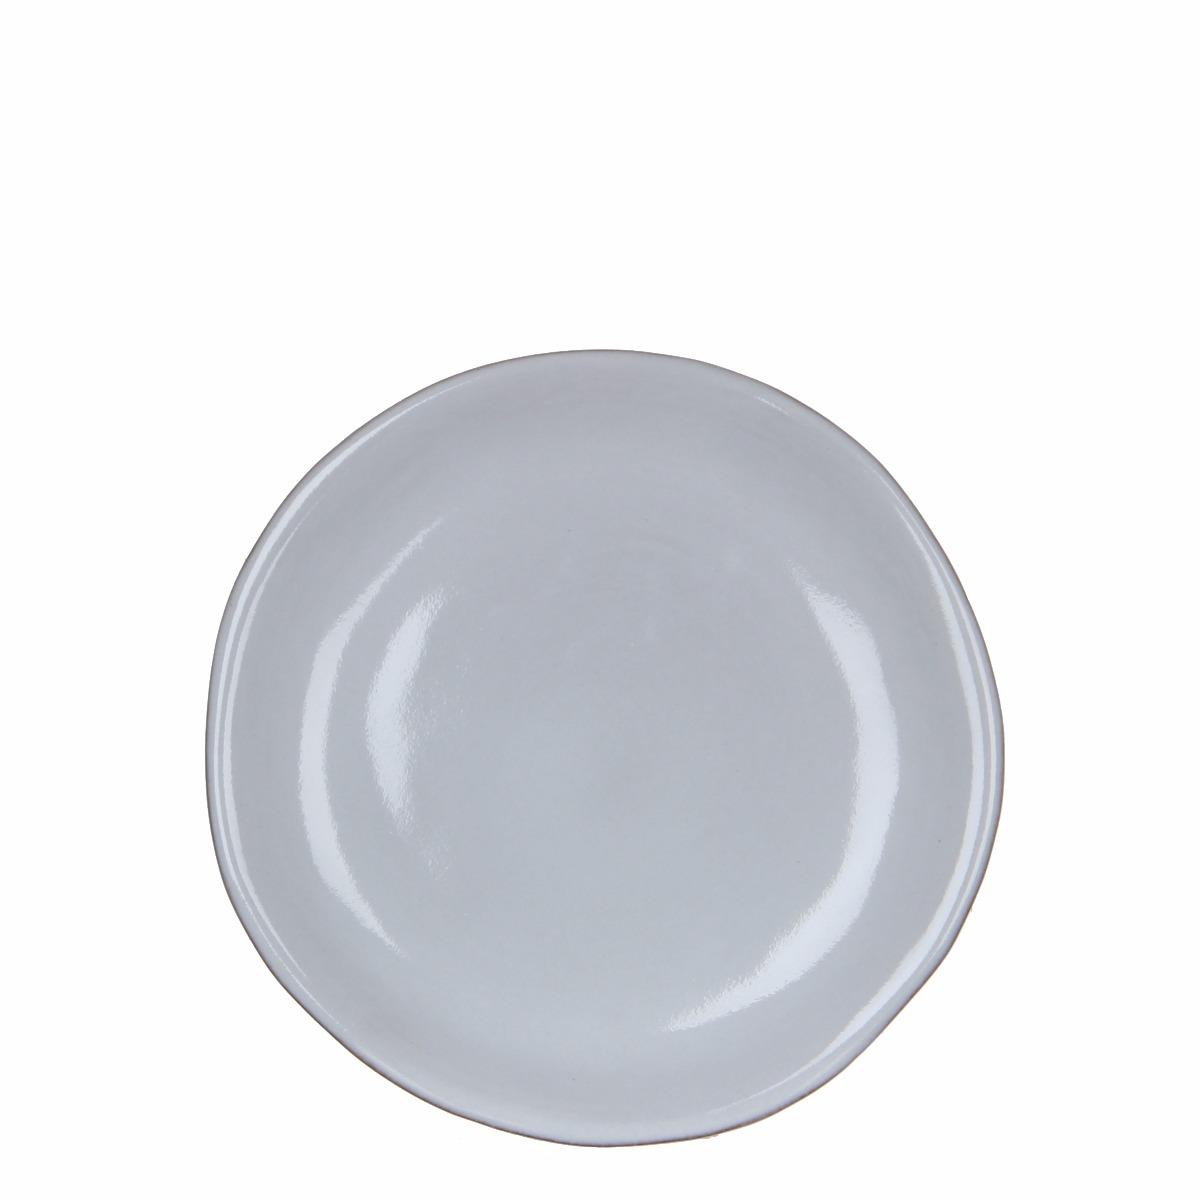 Afbeelding van Casa vivante bord ursula wit h2xd22cm